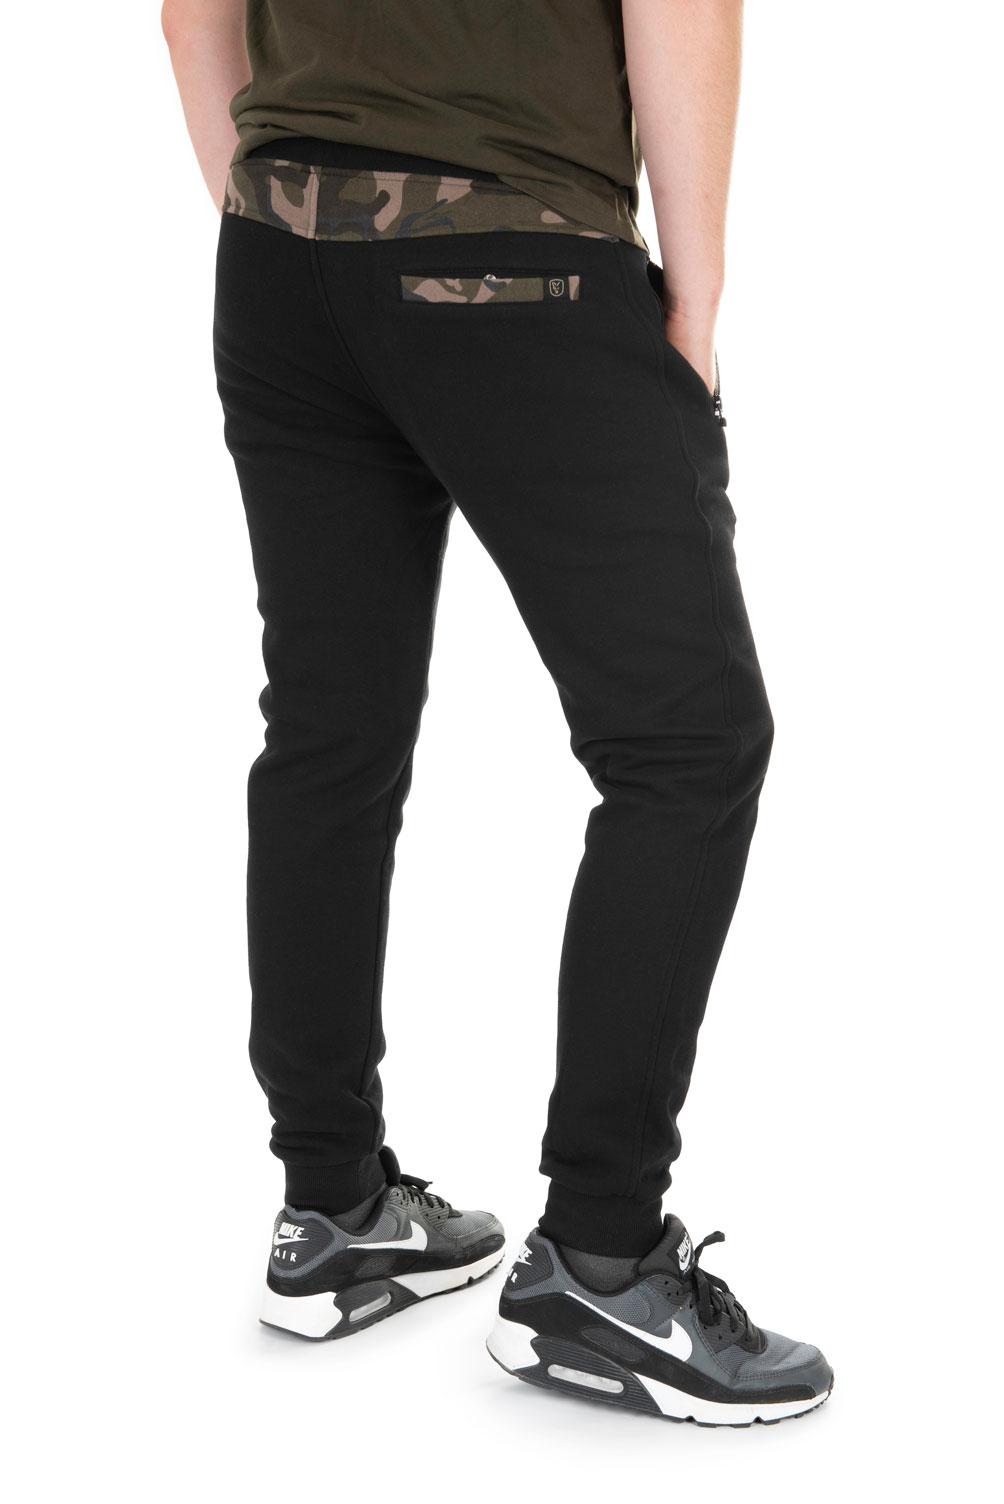 black_camo_logo_joggers_backjpg